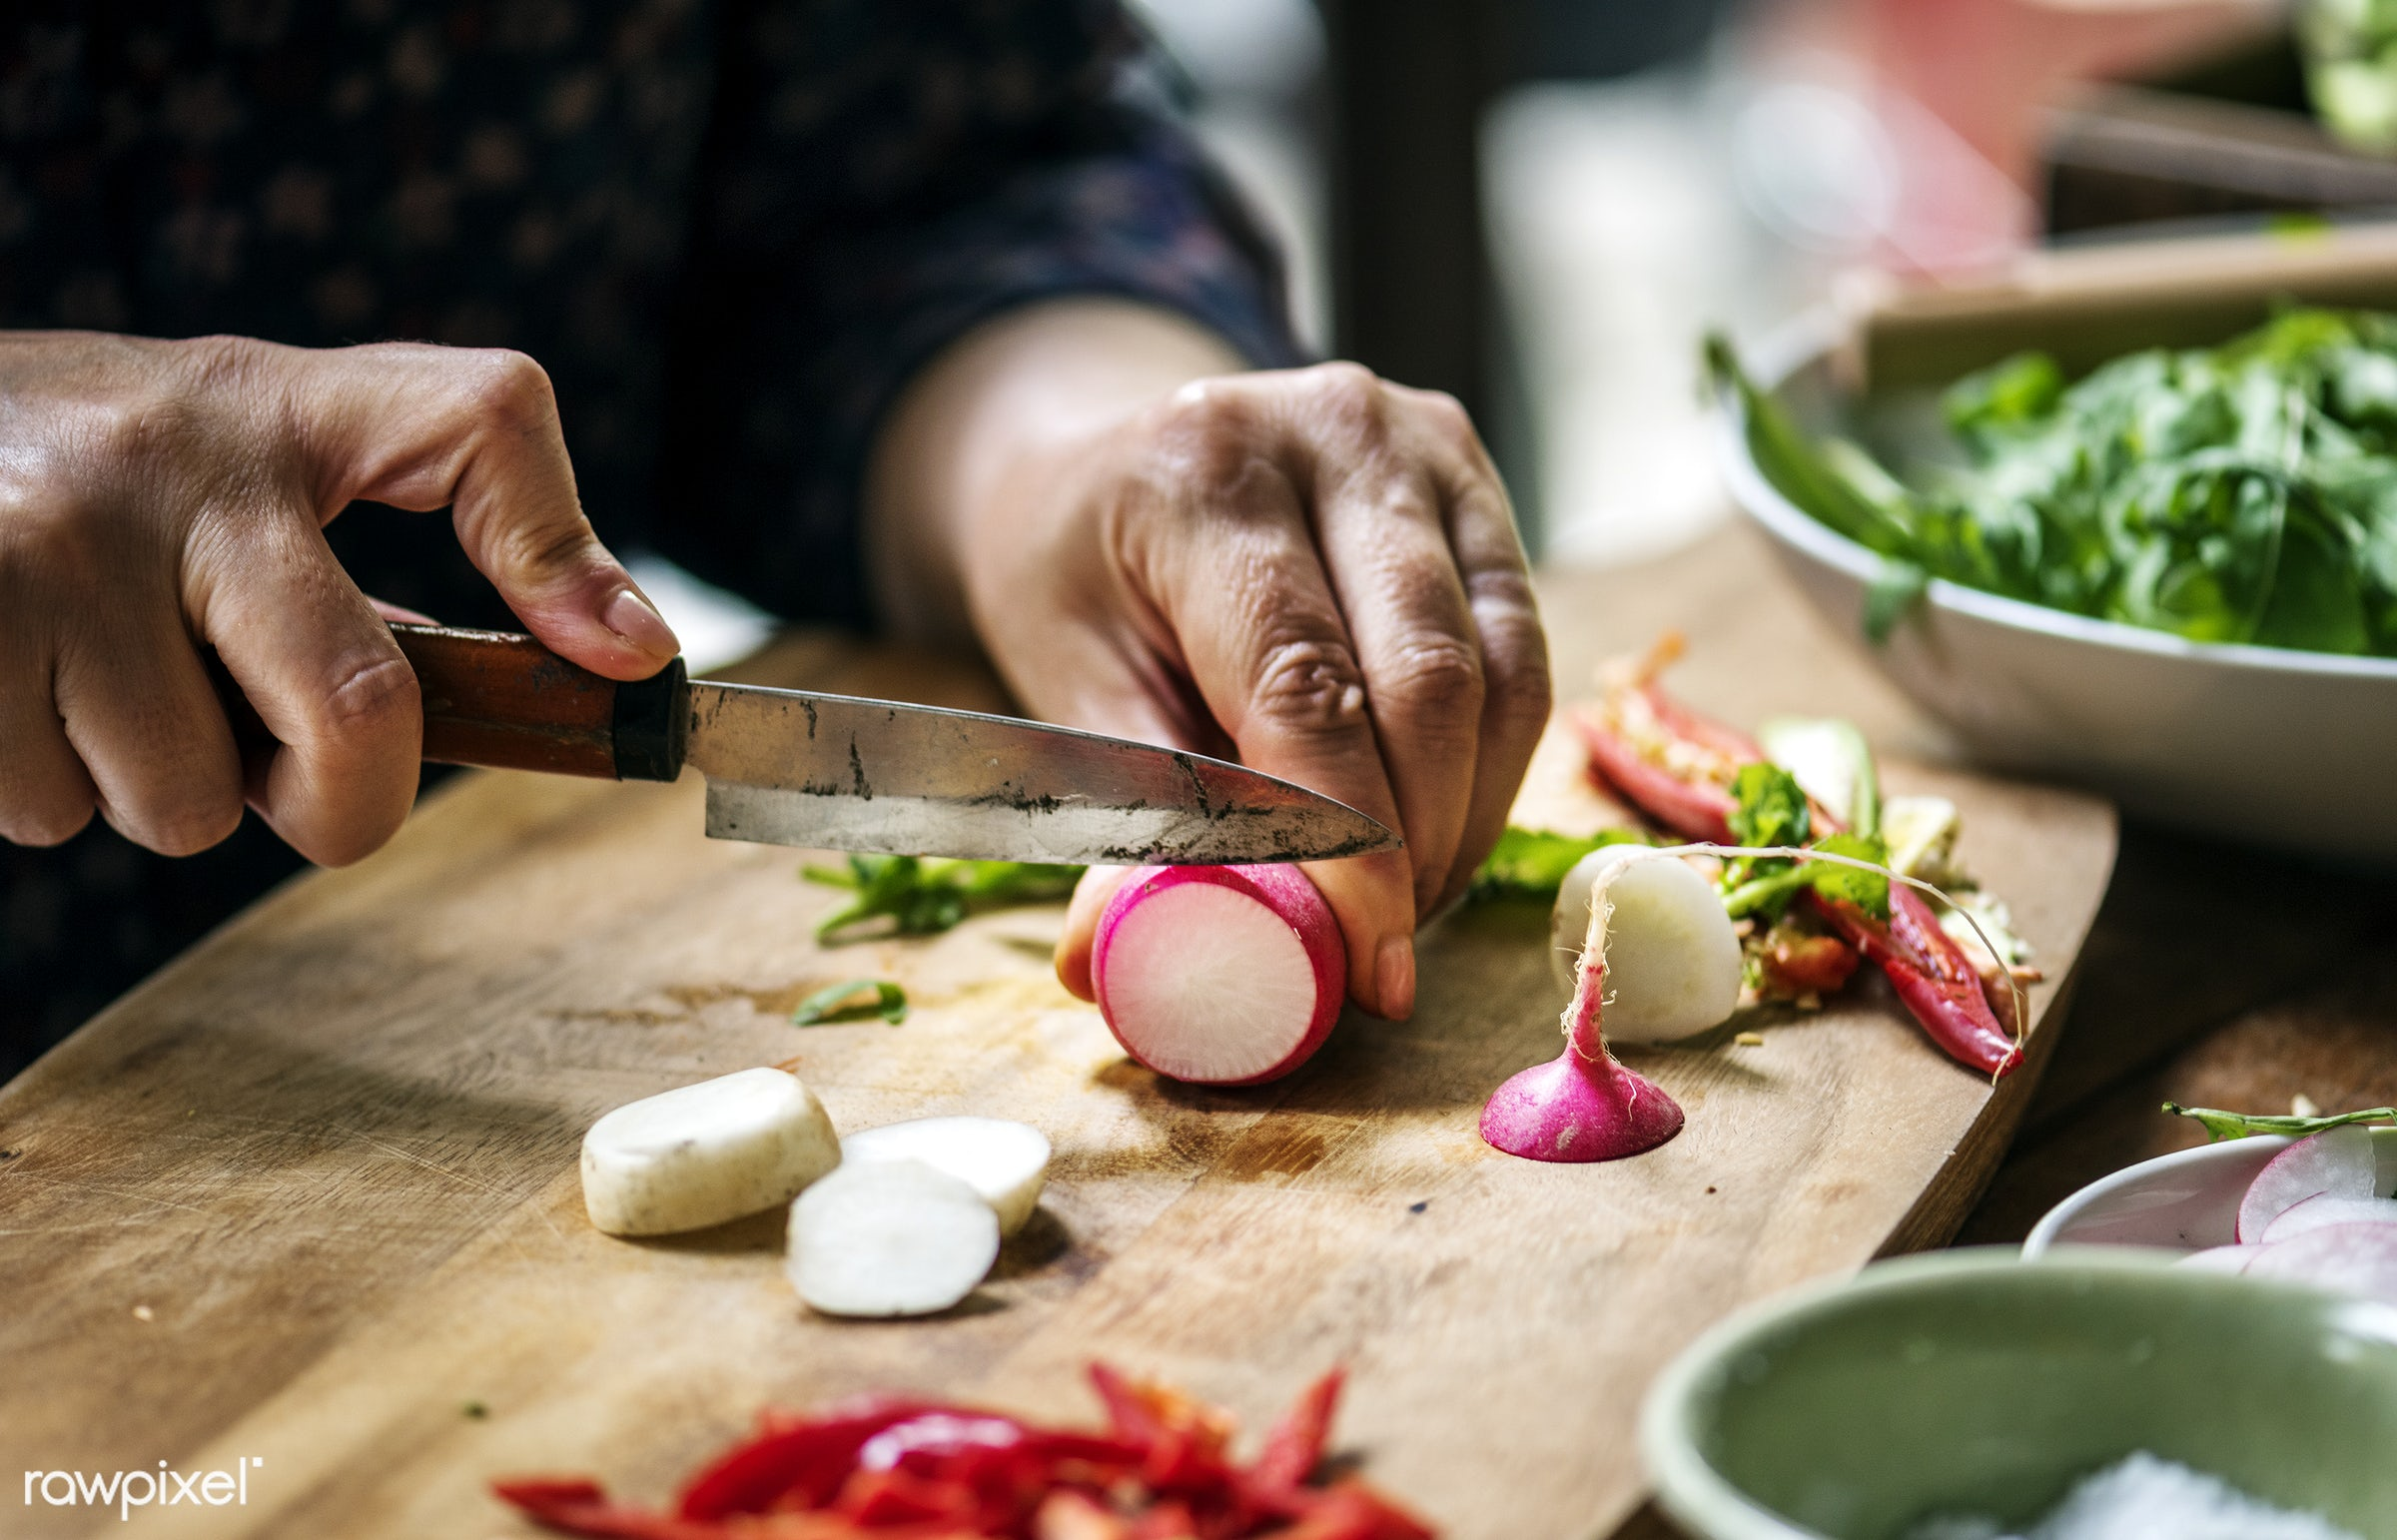 cuisine, variation, turnips, chopping board, type, gastronomy, kind, ingredients, making, cooking, veggie, preparing, knife...